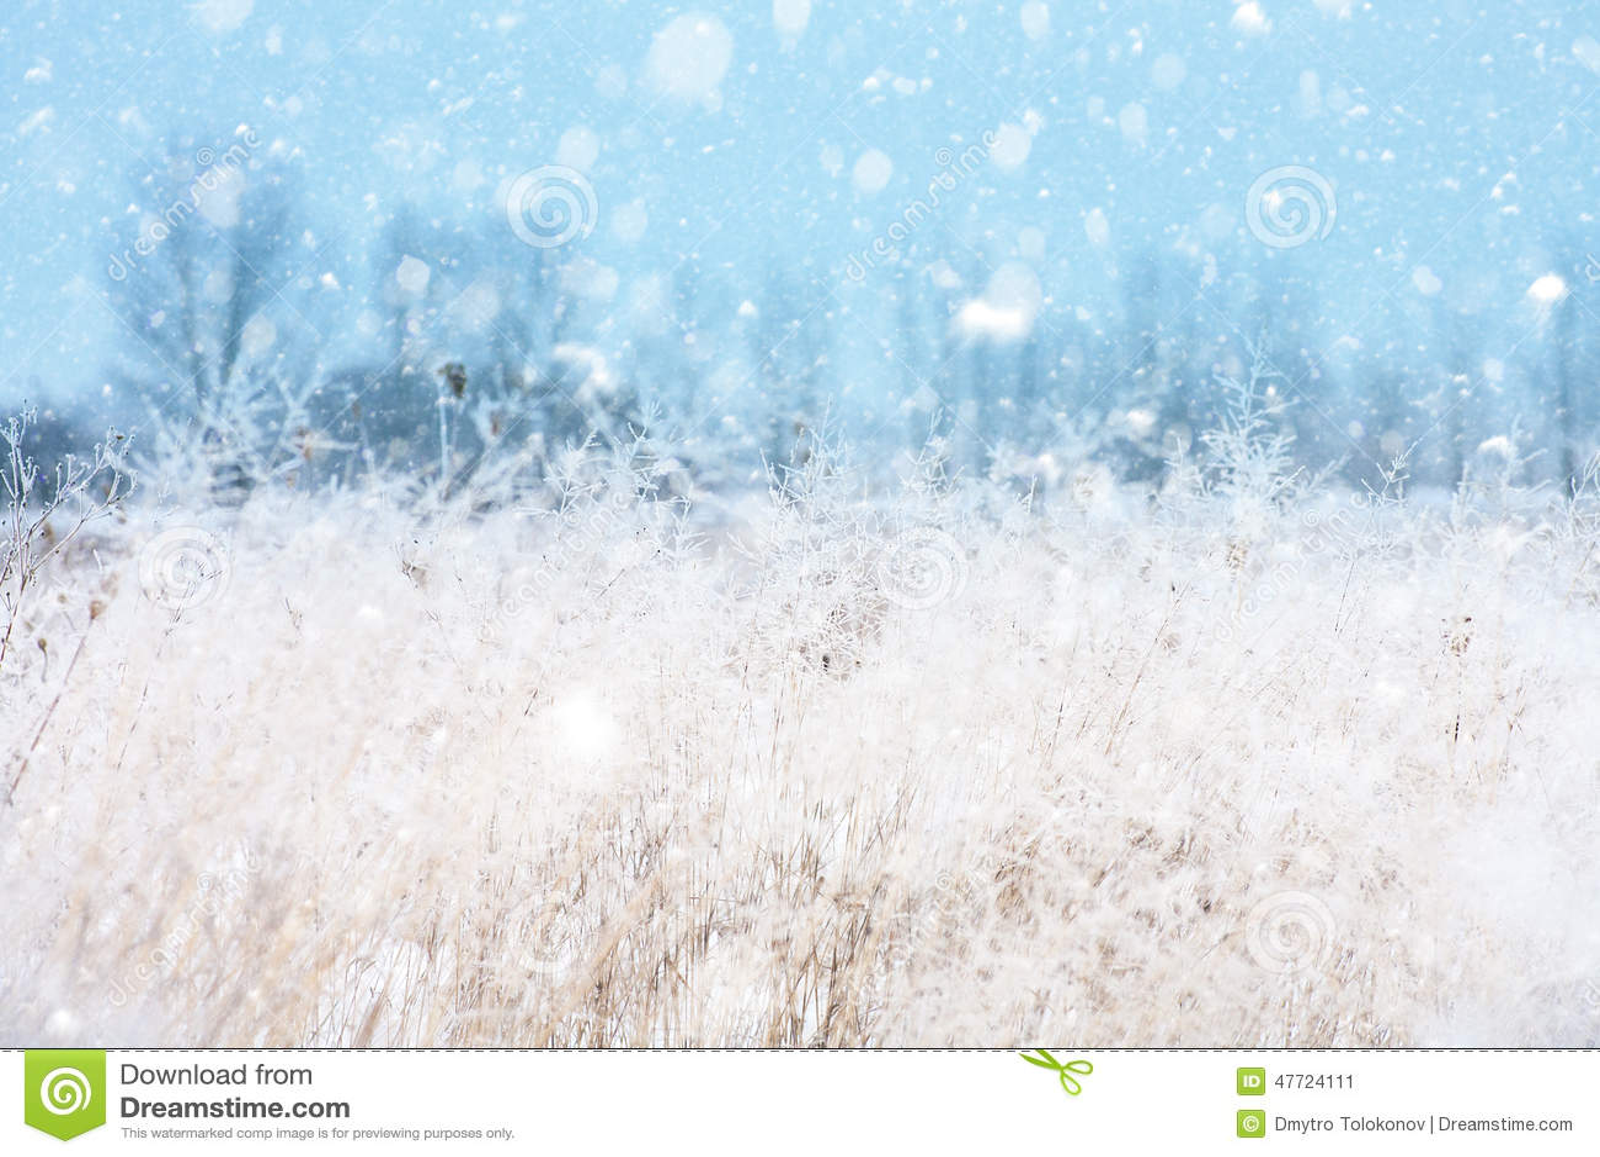 Seasonal Backgrounds With Snowfall Stock Image - Image of ...